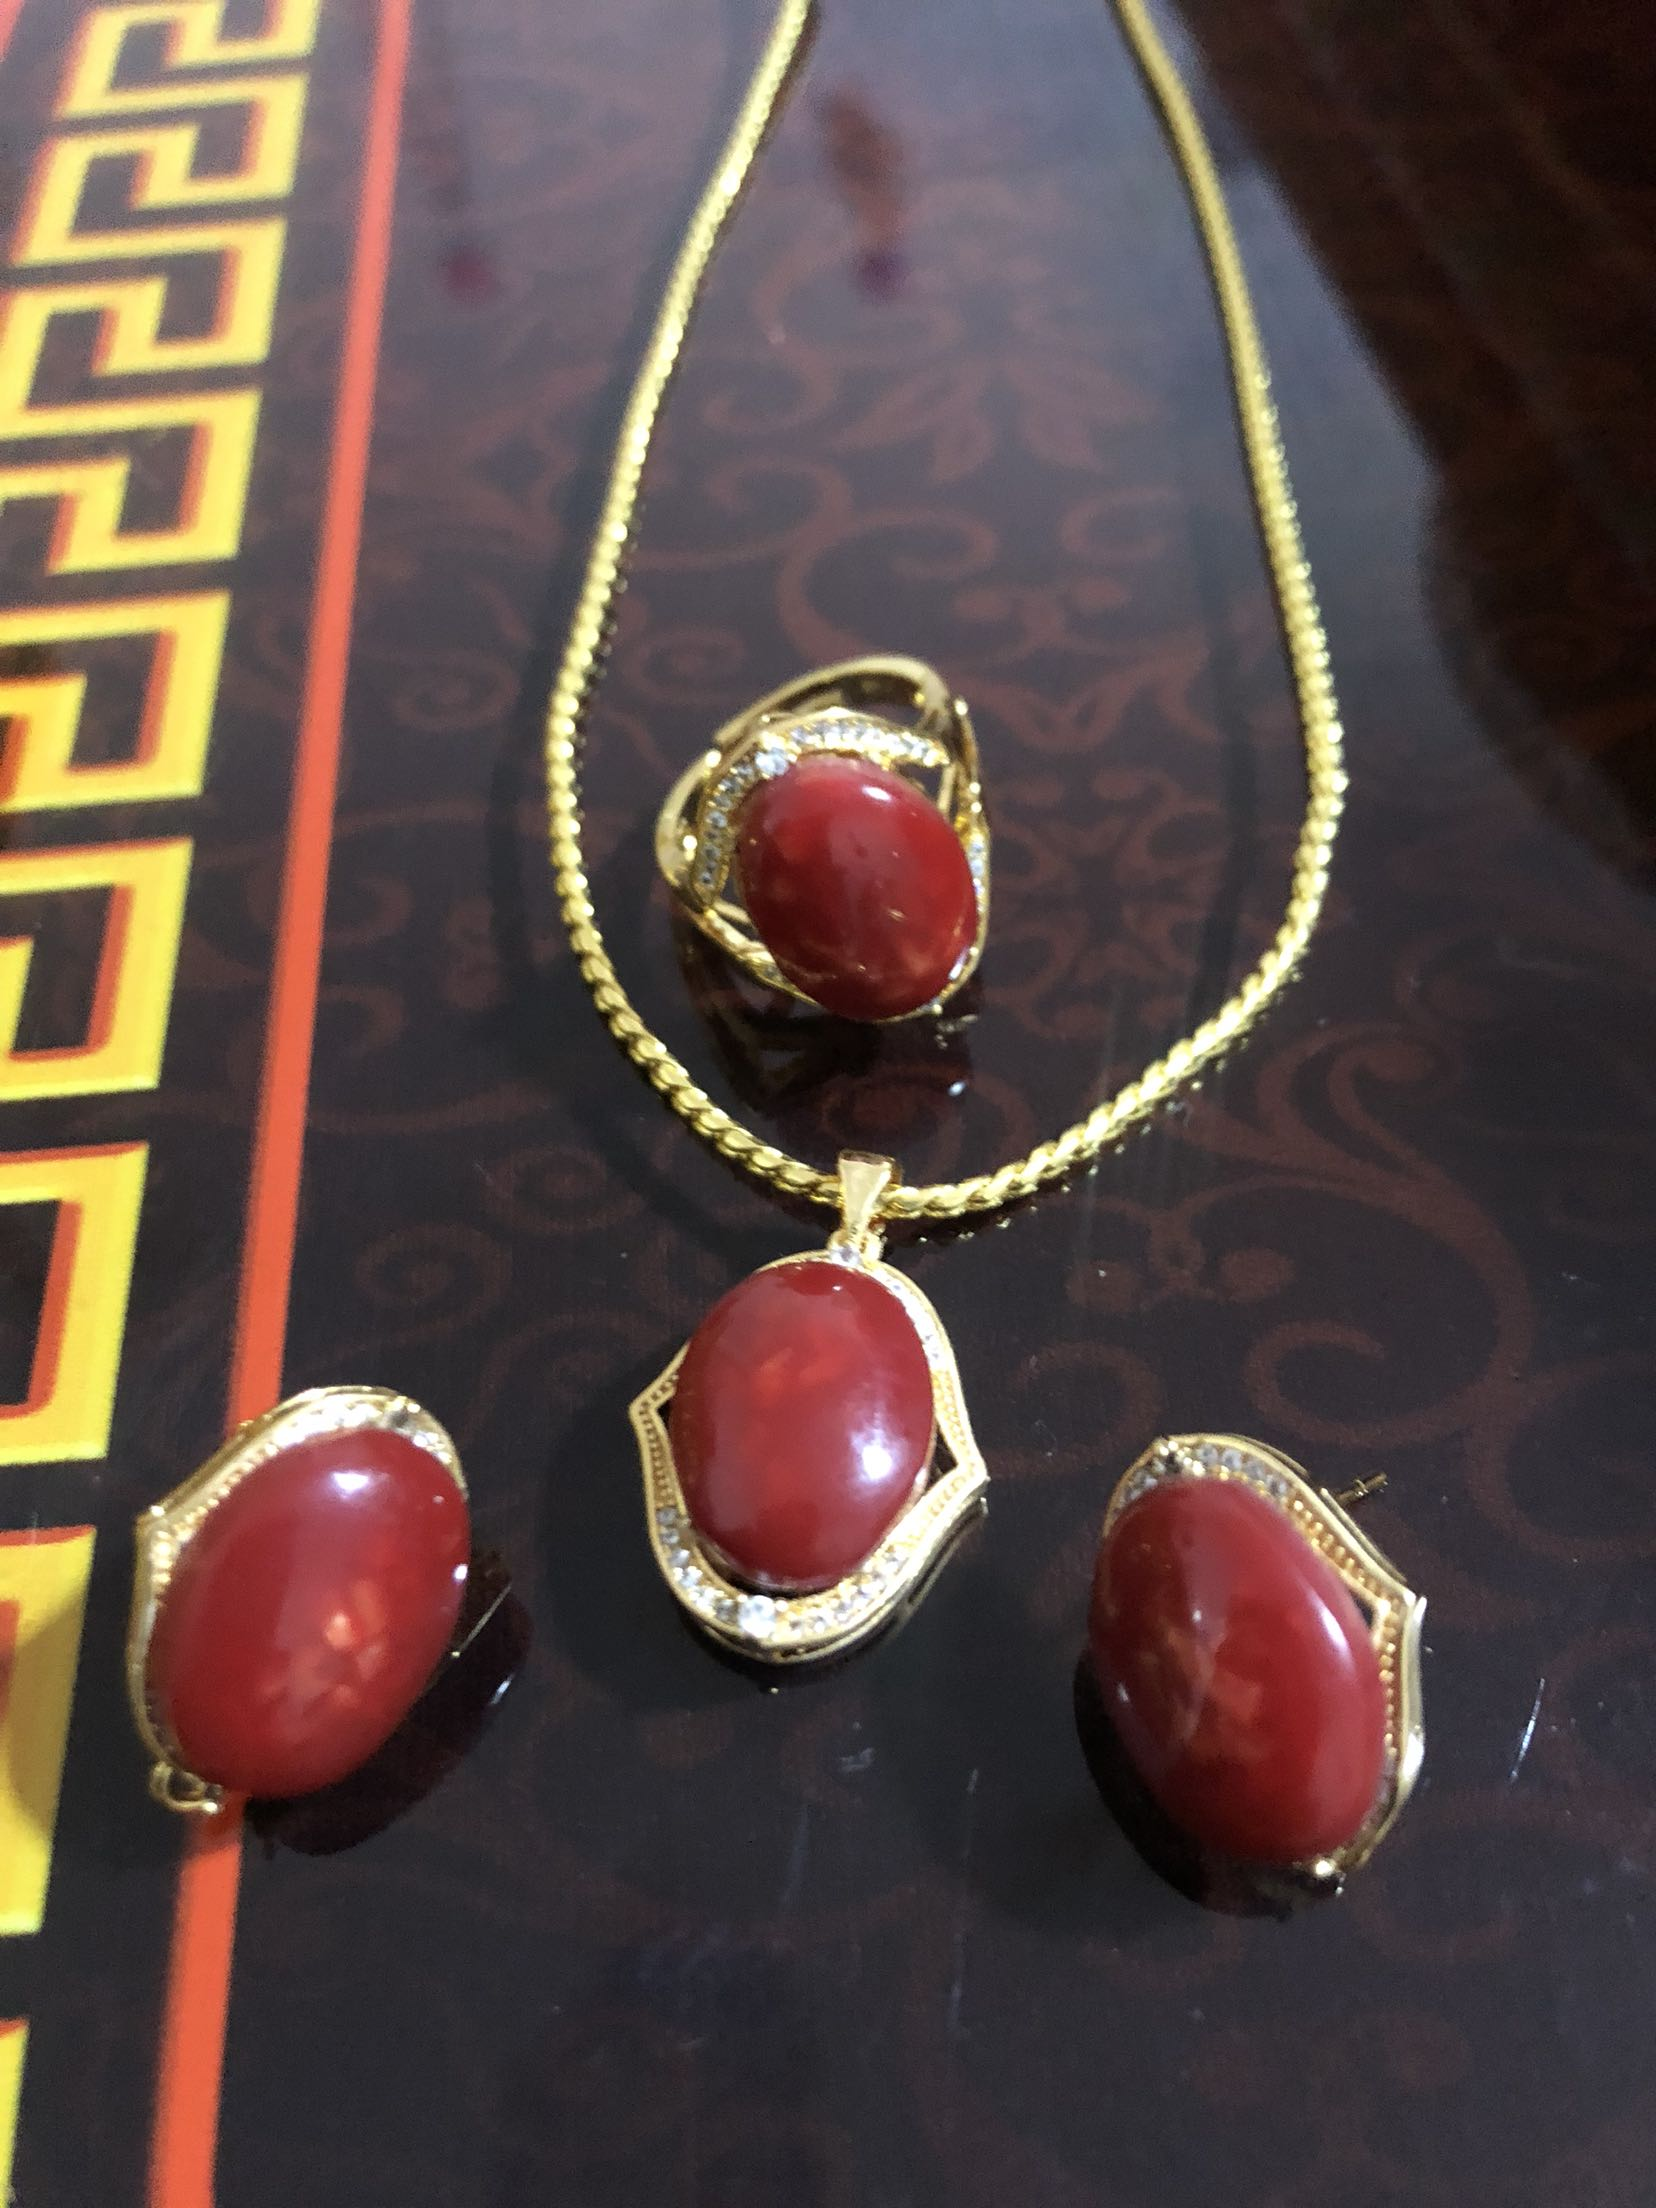 Tibetan net red coral powder earrings necklace ring pendant set Tibetan jewelry